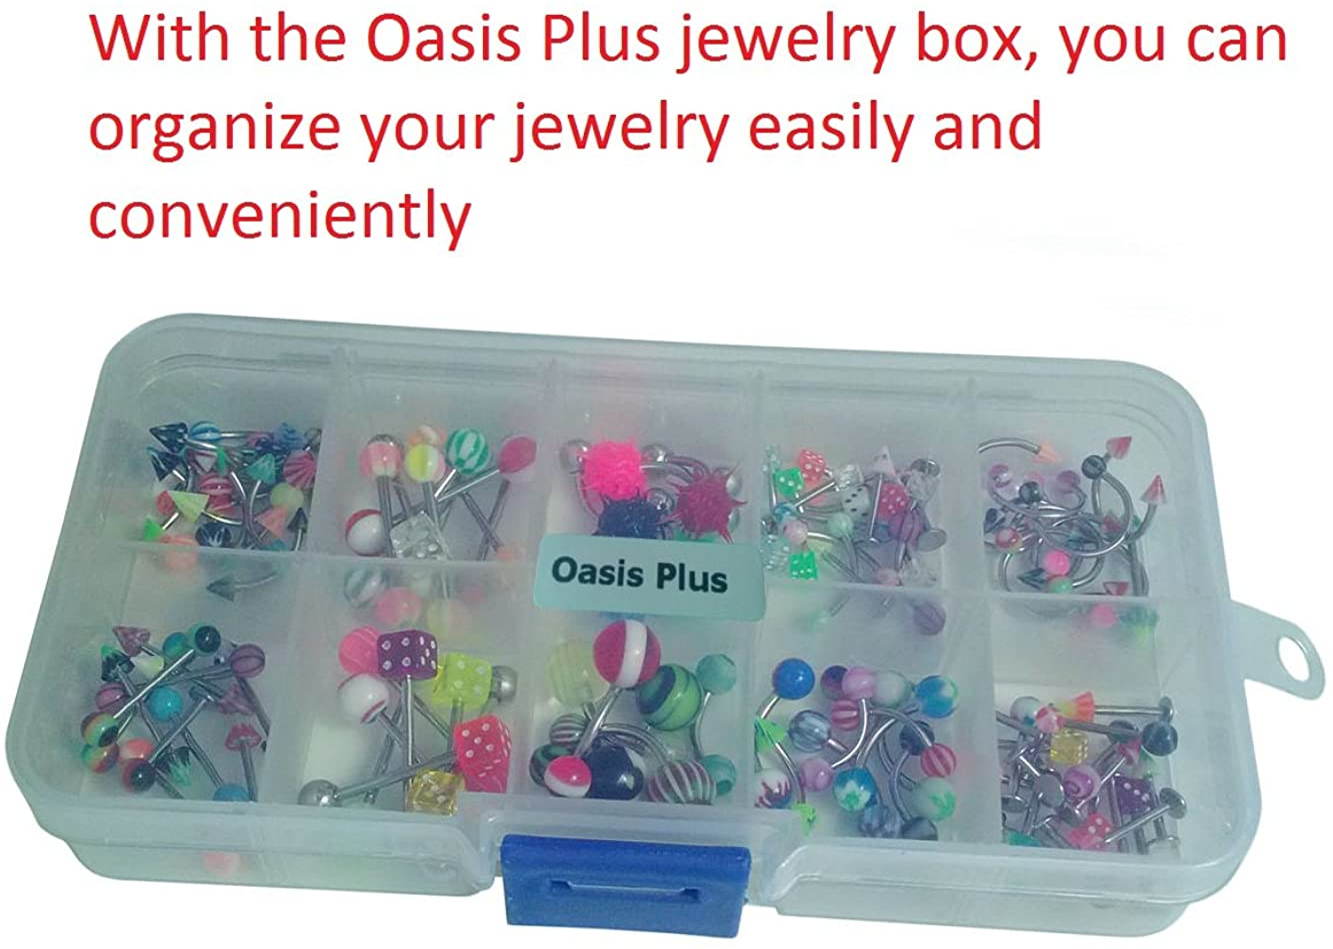 Oasis Plus Lot 110 PCS Body Jewelry Piercing Kit Eyebrow Navel Belly Tongue Lip Bar Nose Ring 22 Styles (No Duplicates)